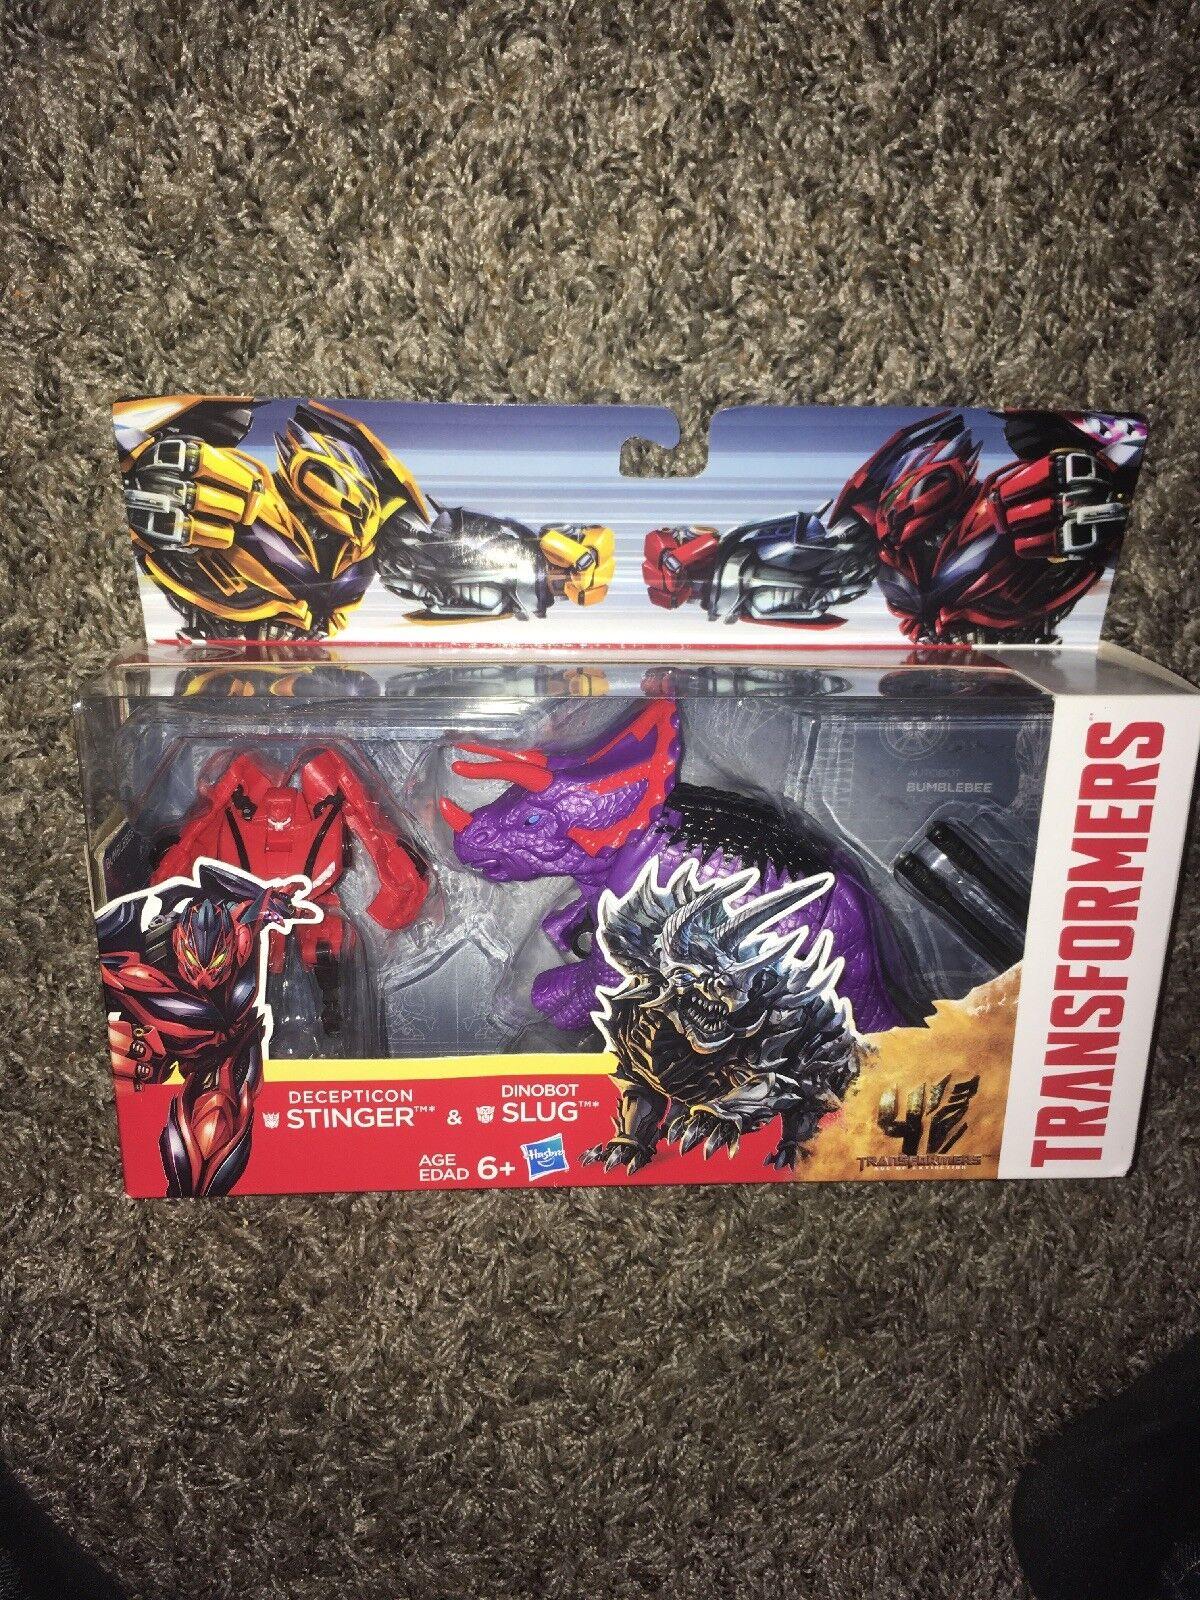 Transformers AOE Stinger Vs Dinobot Slug Walmart Exclusive Set MISB Hasbro 2014